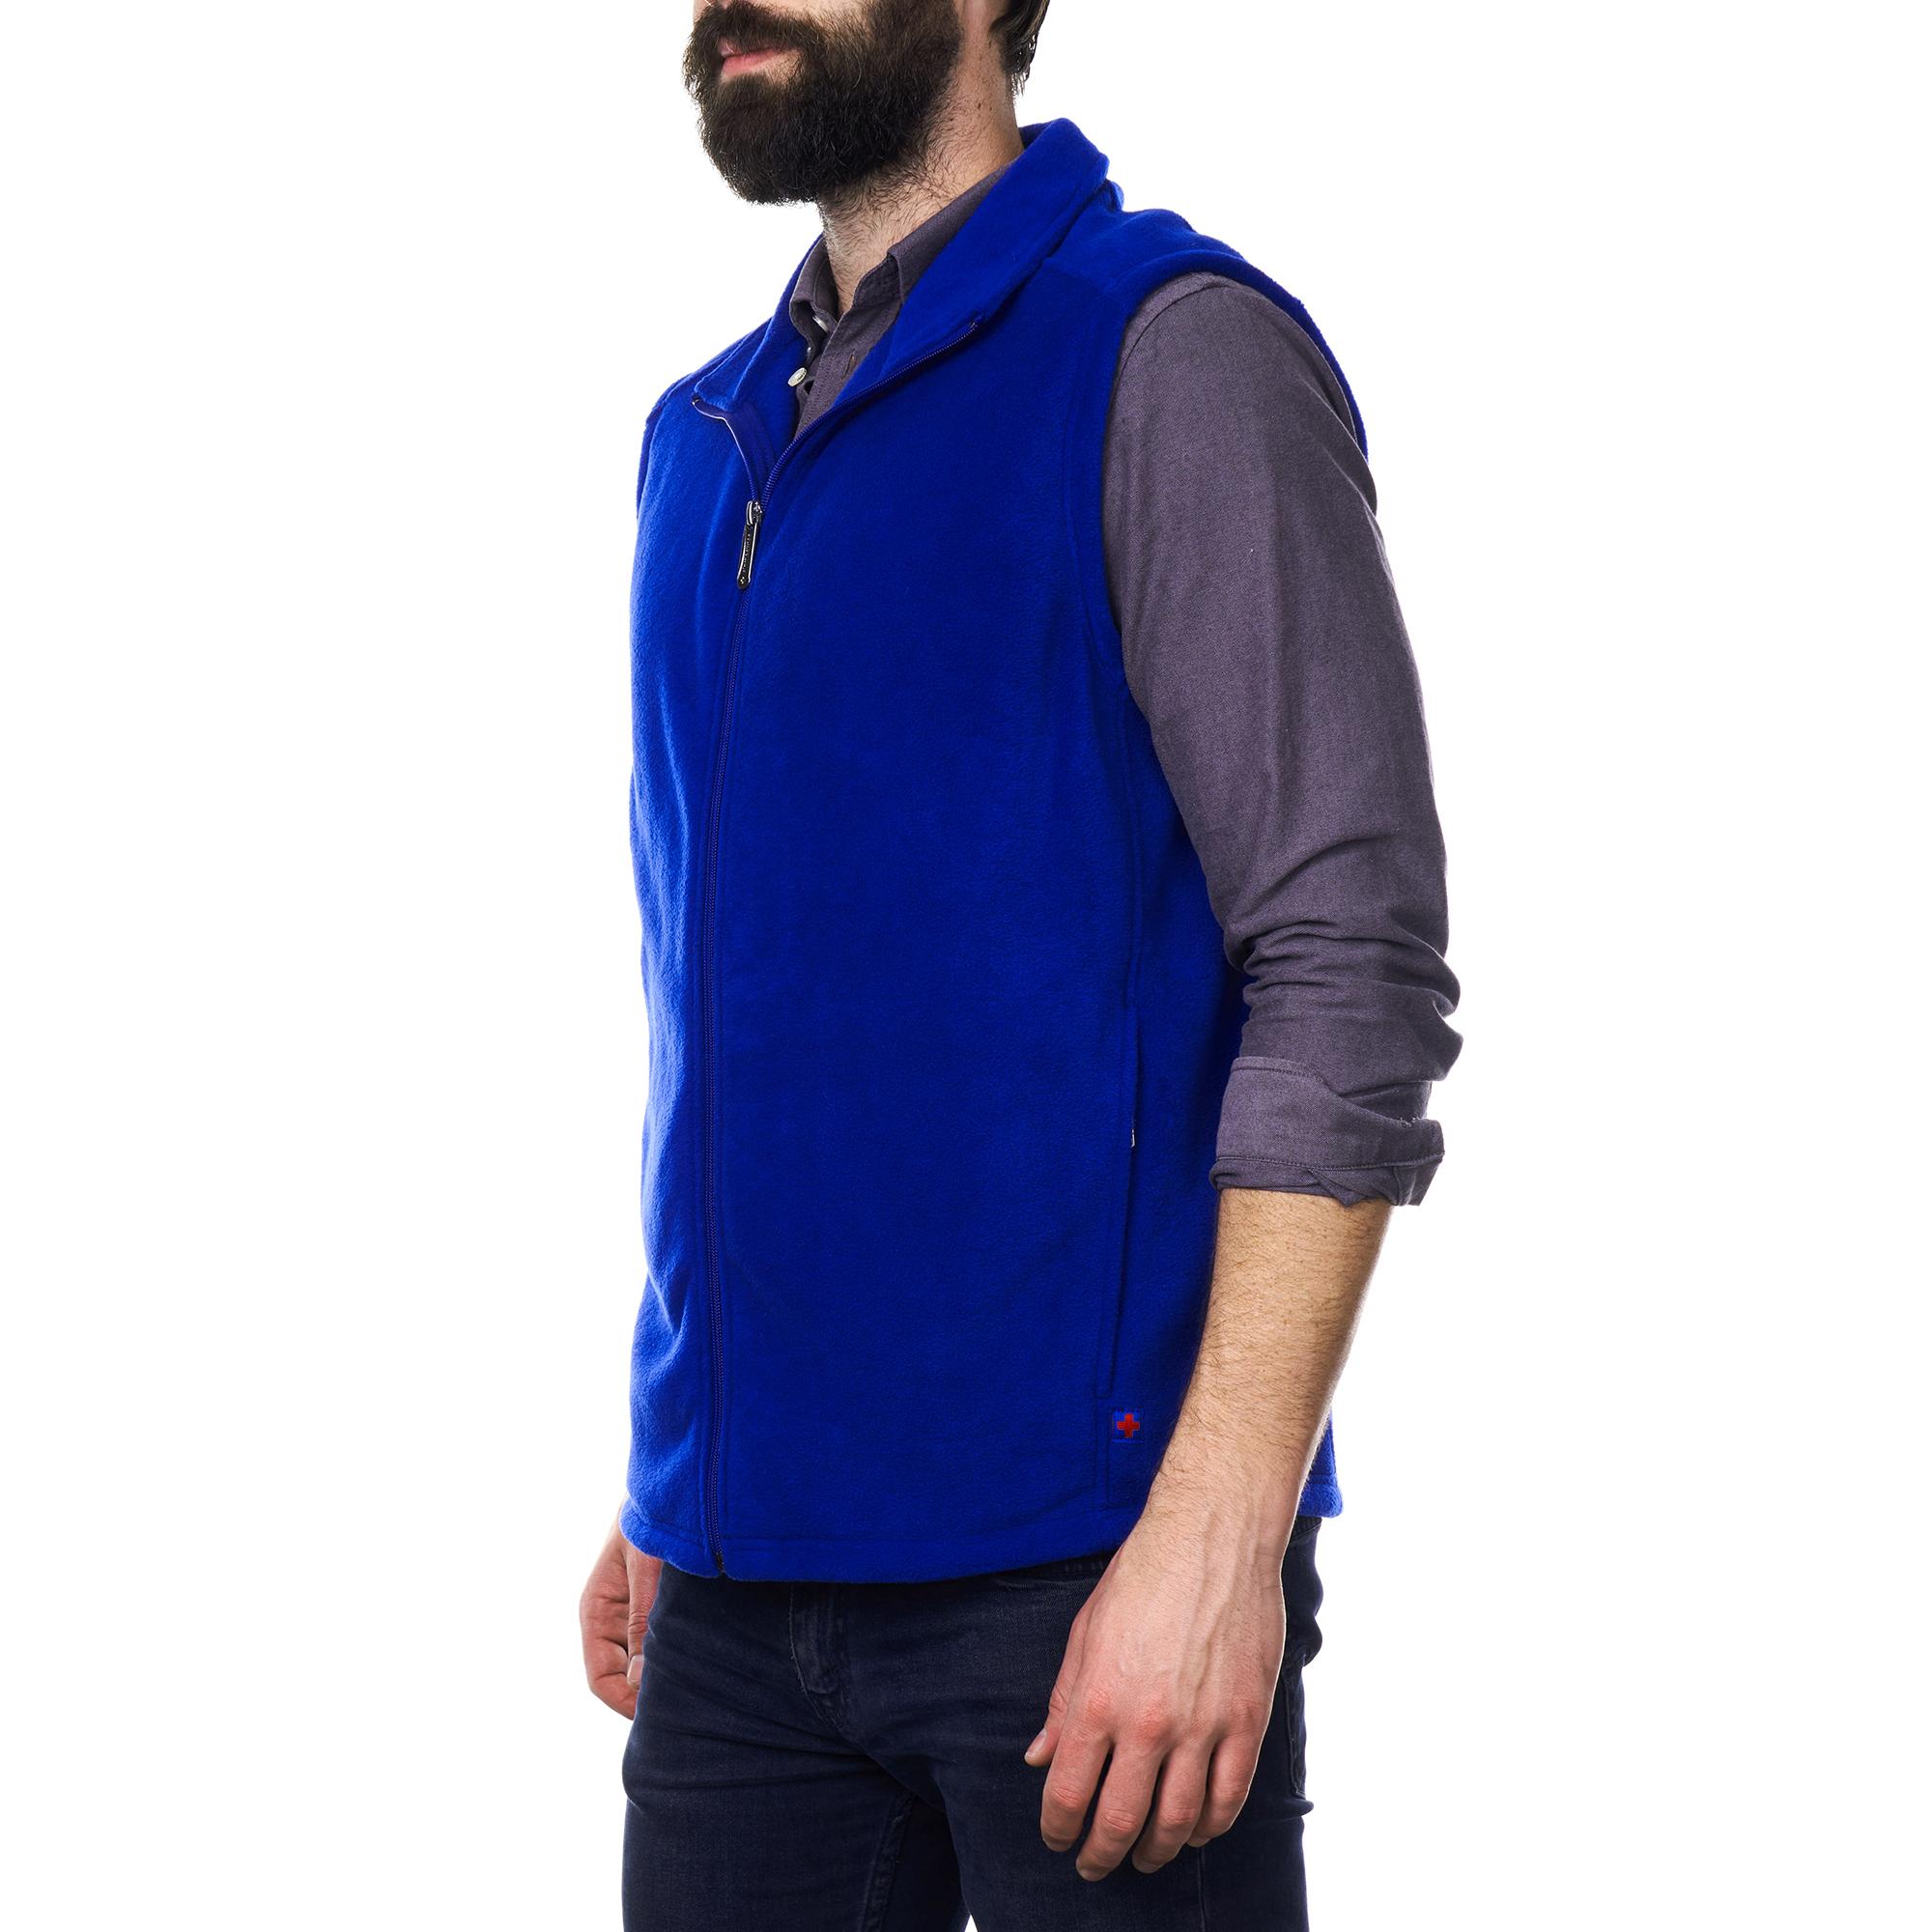 Alpine-Swiss-Mens-Full-Zip-Up-Fleece-Vest-Lightweight-Warm-Sleeveless-Jacket thumbnail 23